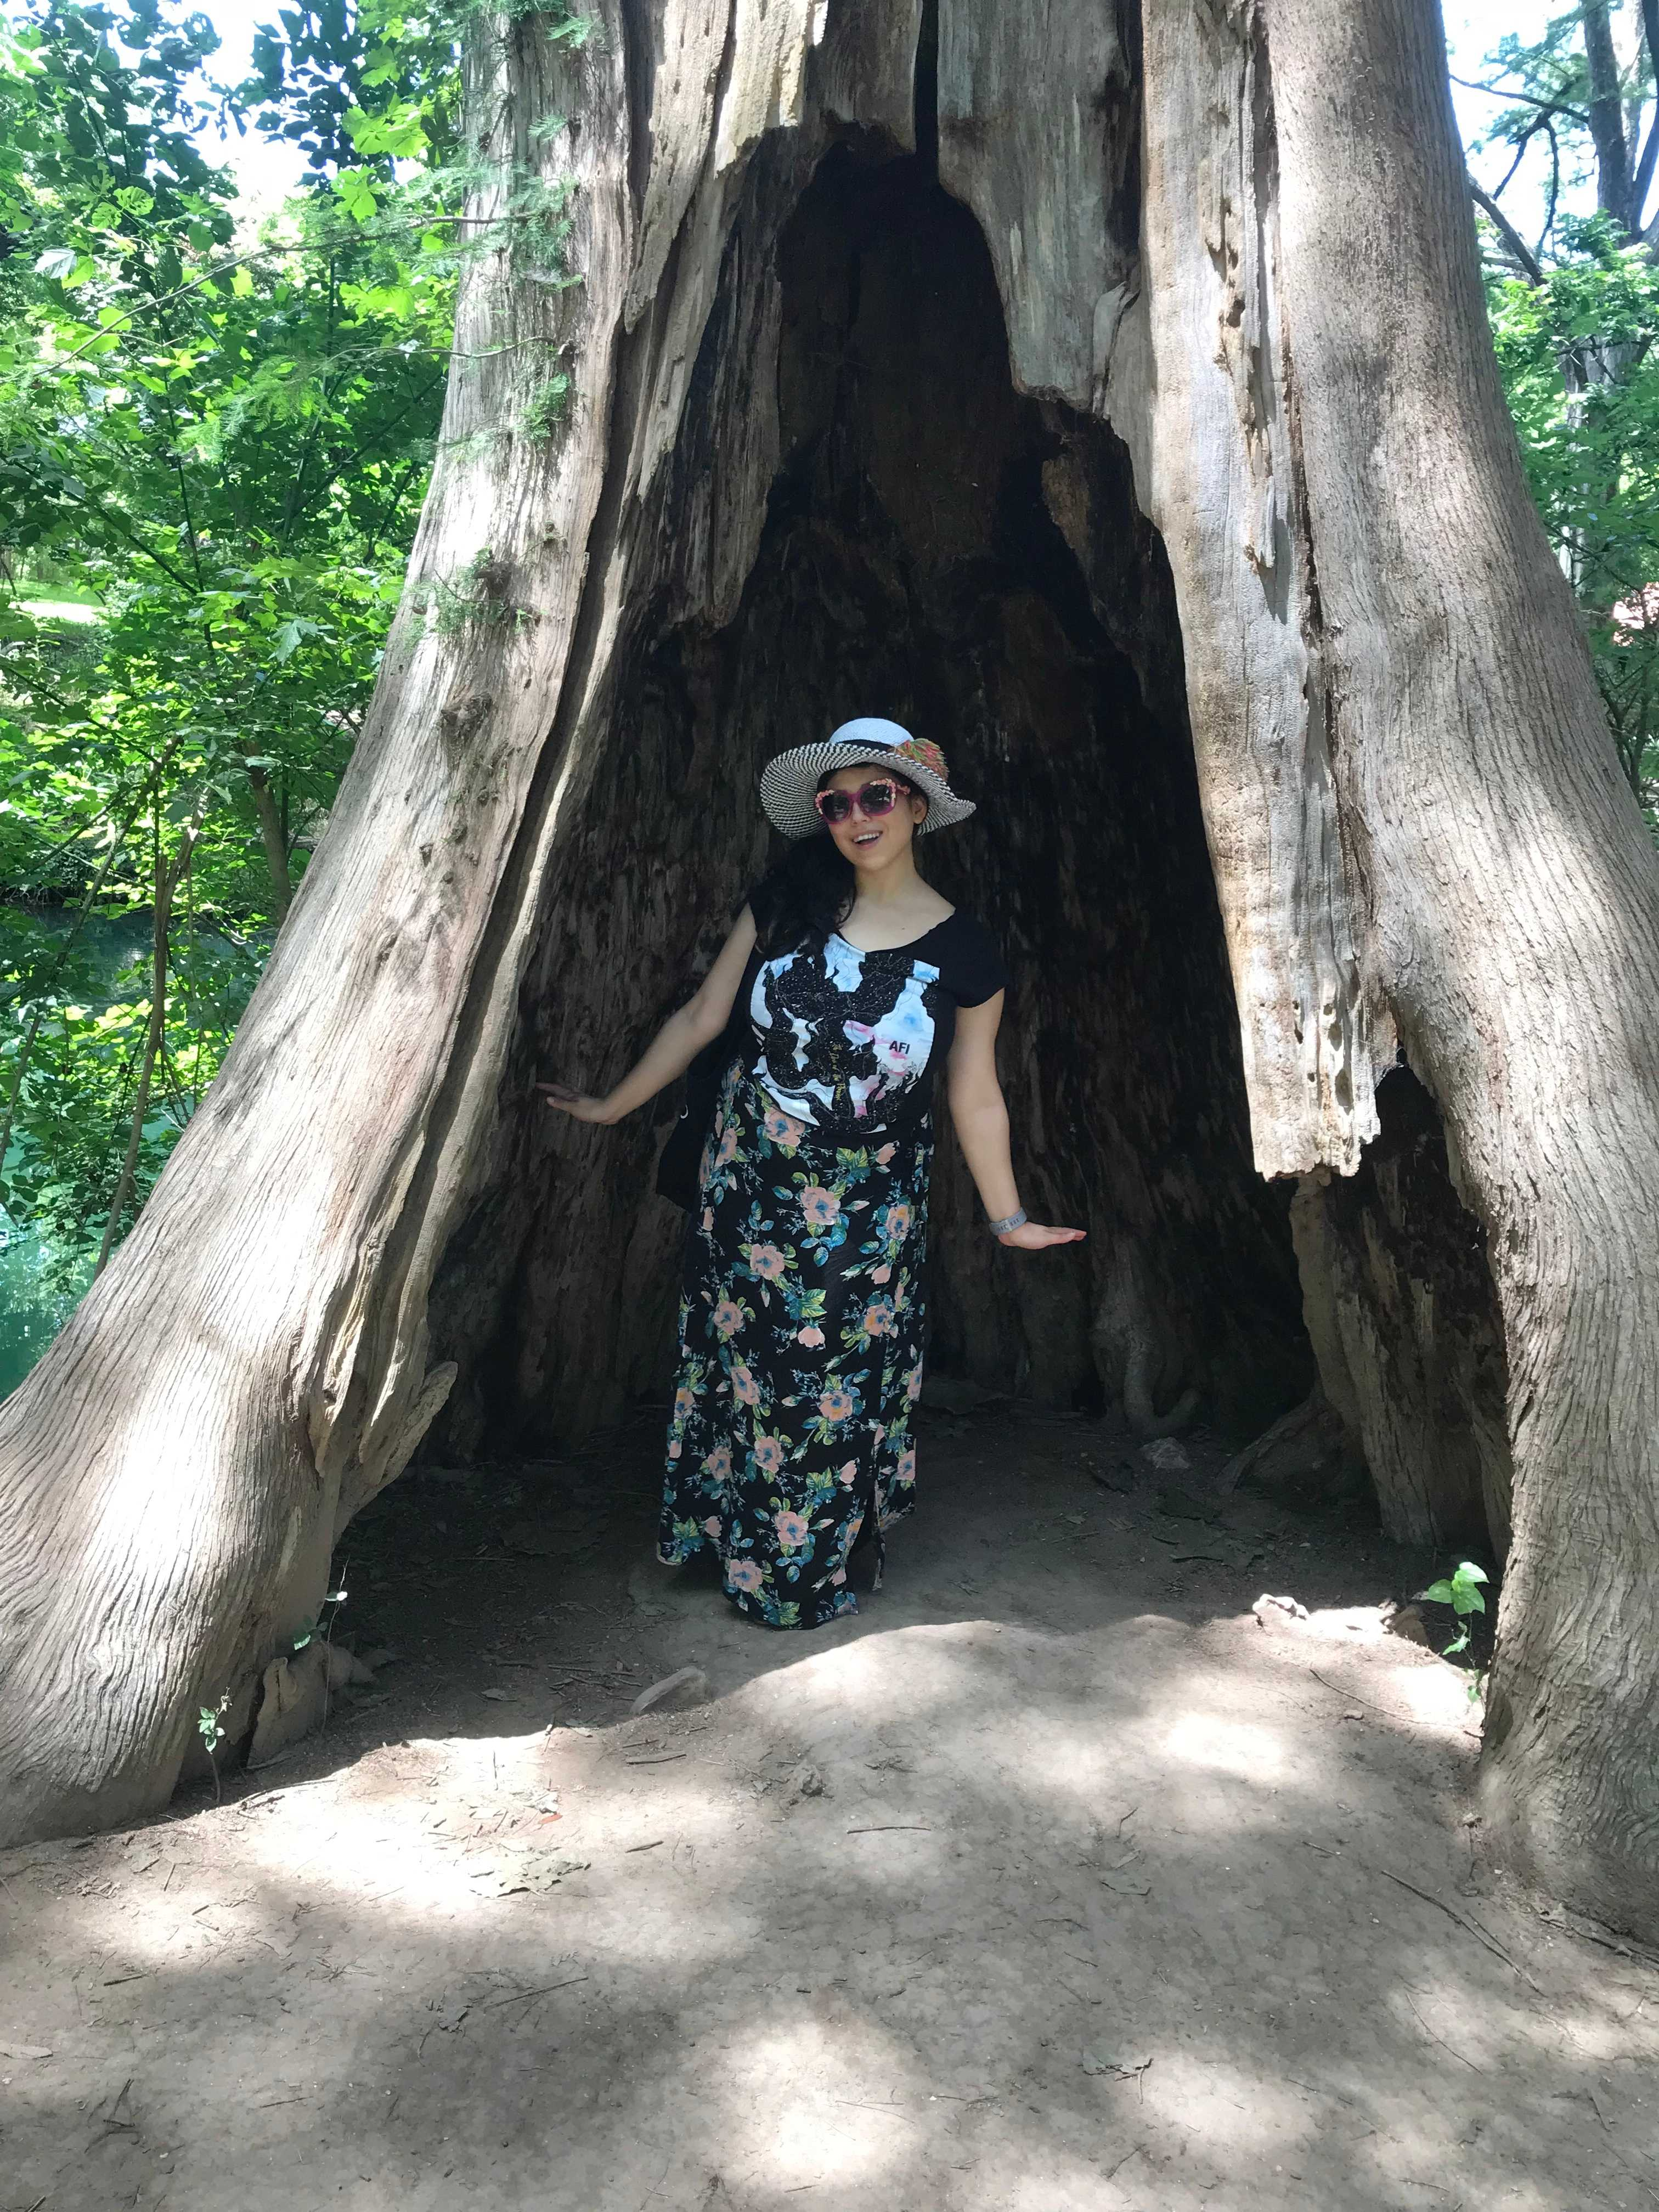 Road trip fun with a tree in Wimberley, Texas